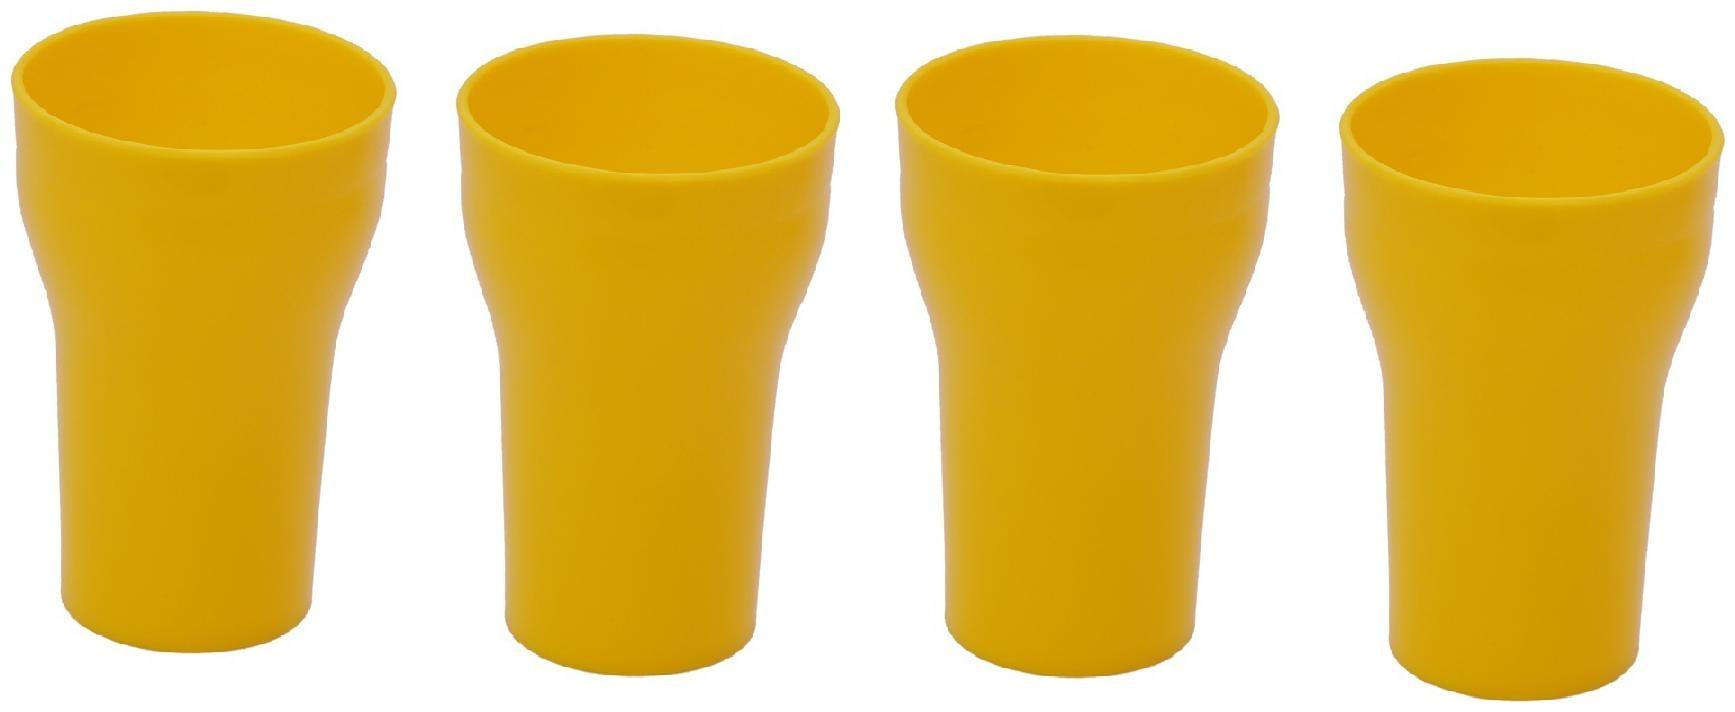 Unbreakable Multipurpose Fancy Glass Yellow 300 ml Pack of 4